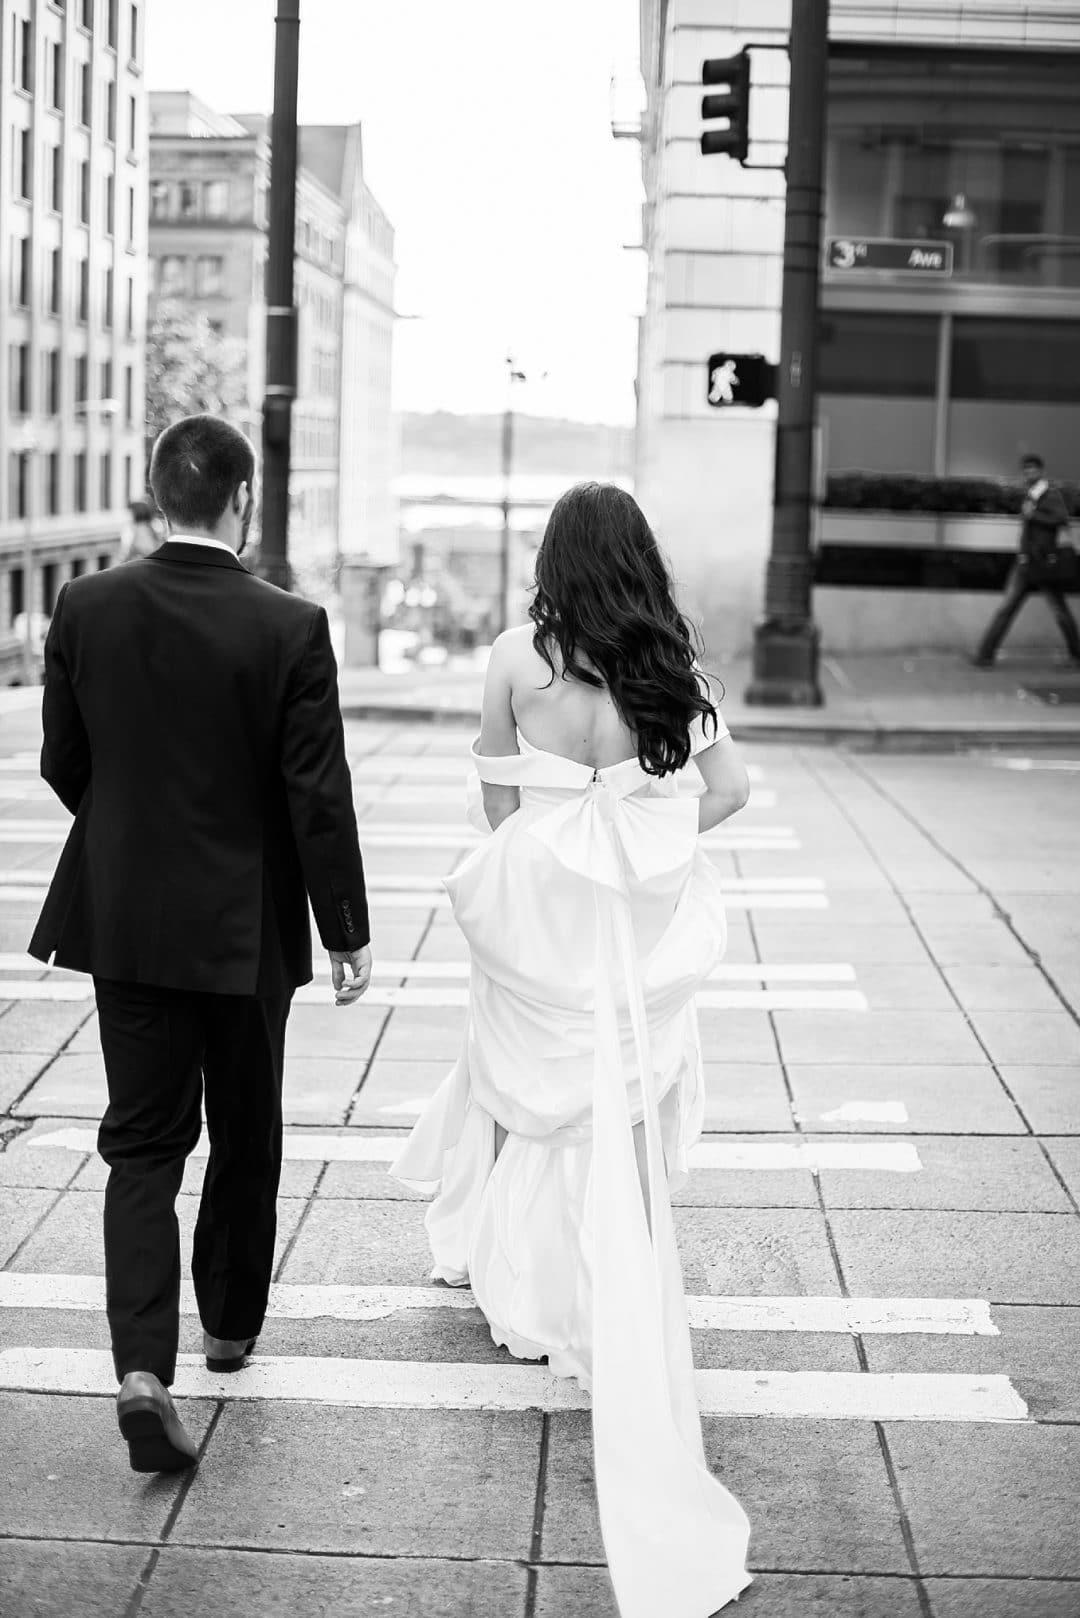 Wedding -  - nkimaphotography com notting hill 0325